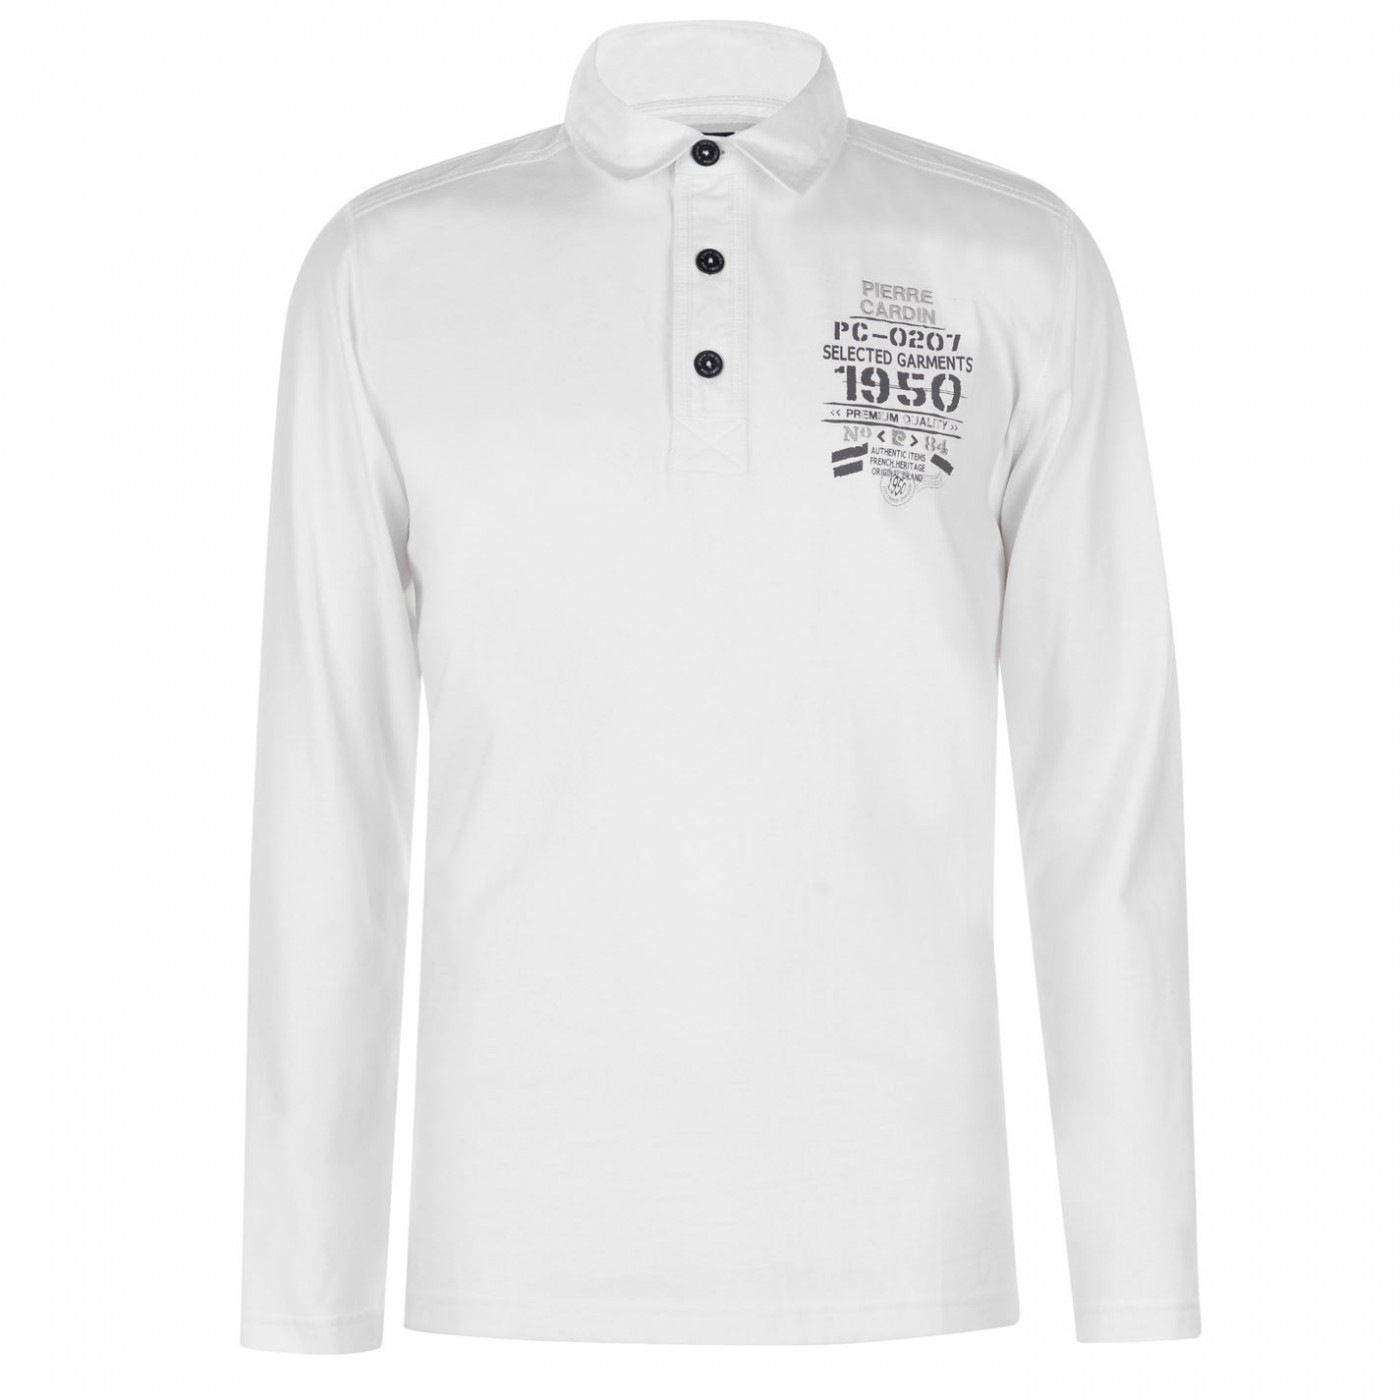 Pierre Cardin Long Sleeve Polo Shirt Mens